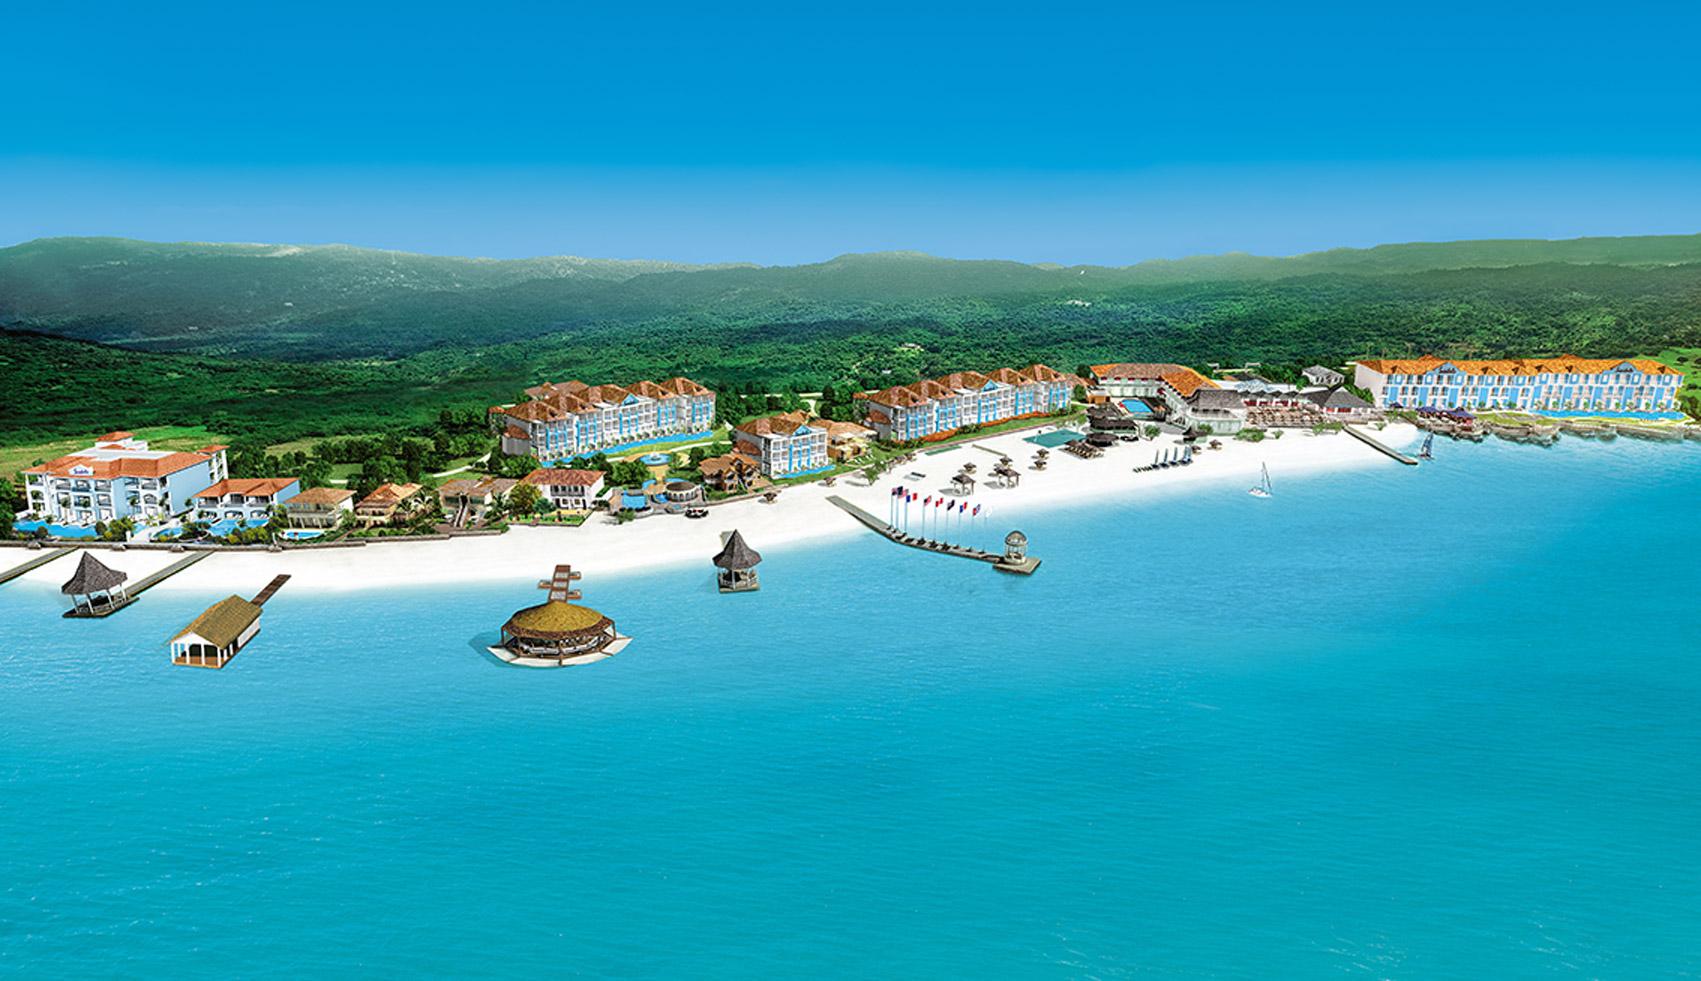 Maps - Sandals Montego Bay Resort in Jamaica Sandals Resorts Locations Map on sandals resort st. lucia map, sandals halcyon map, sandals antigua map, sandals jamaica map, sandals ocho rios resort map, sandals resort nassau bahamas map,